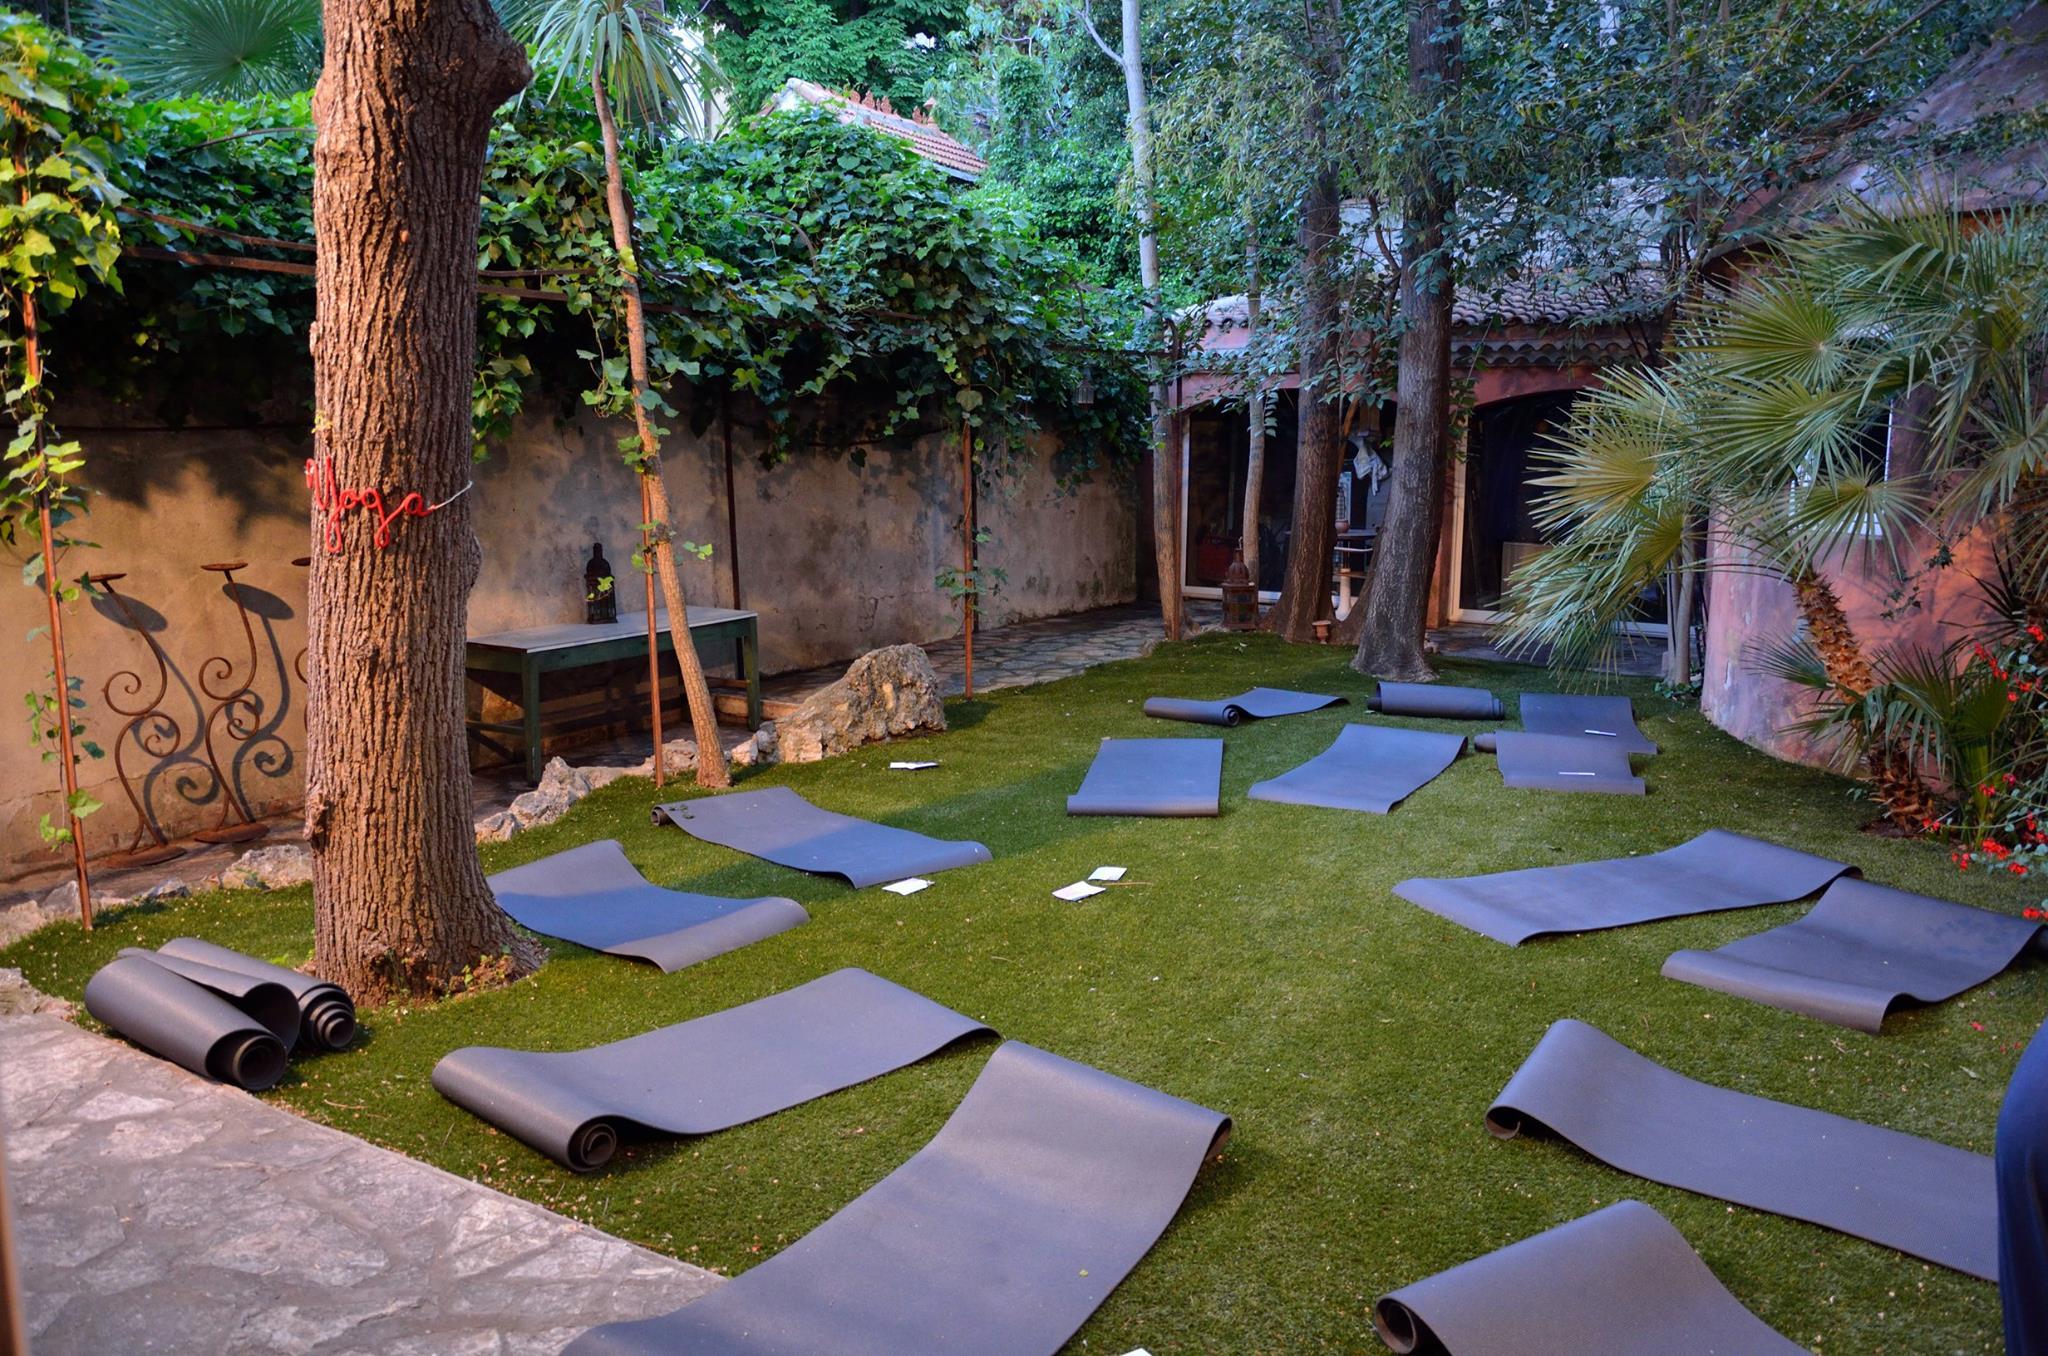 Weleda_bioty_tour_espace_cote_calanques_marseille_jardin-tapis_yoga